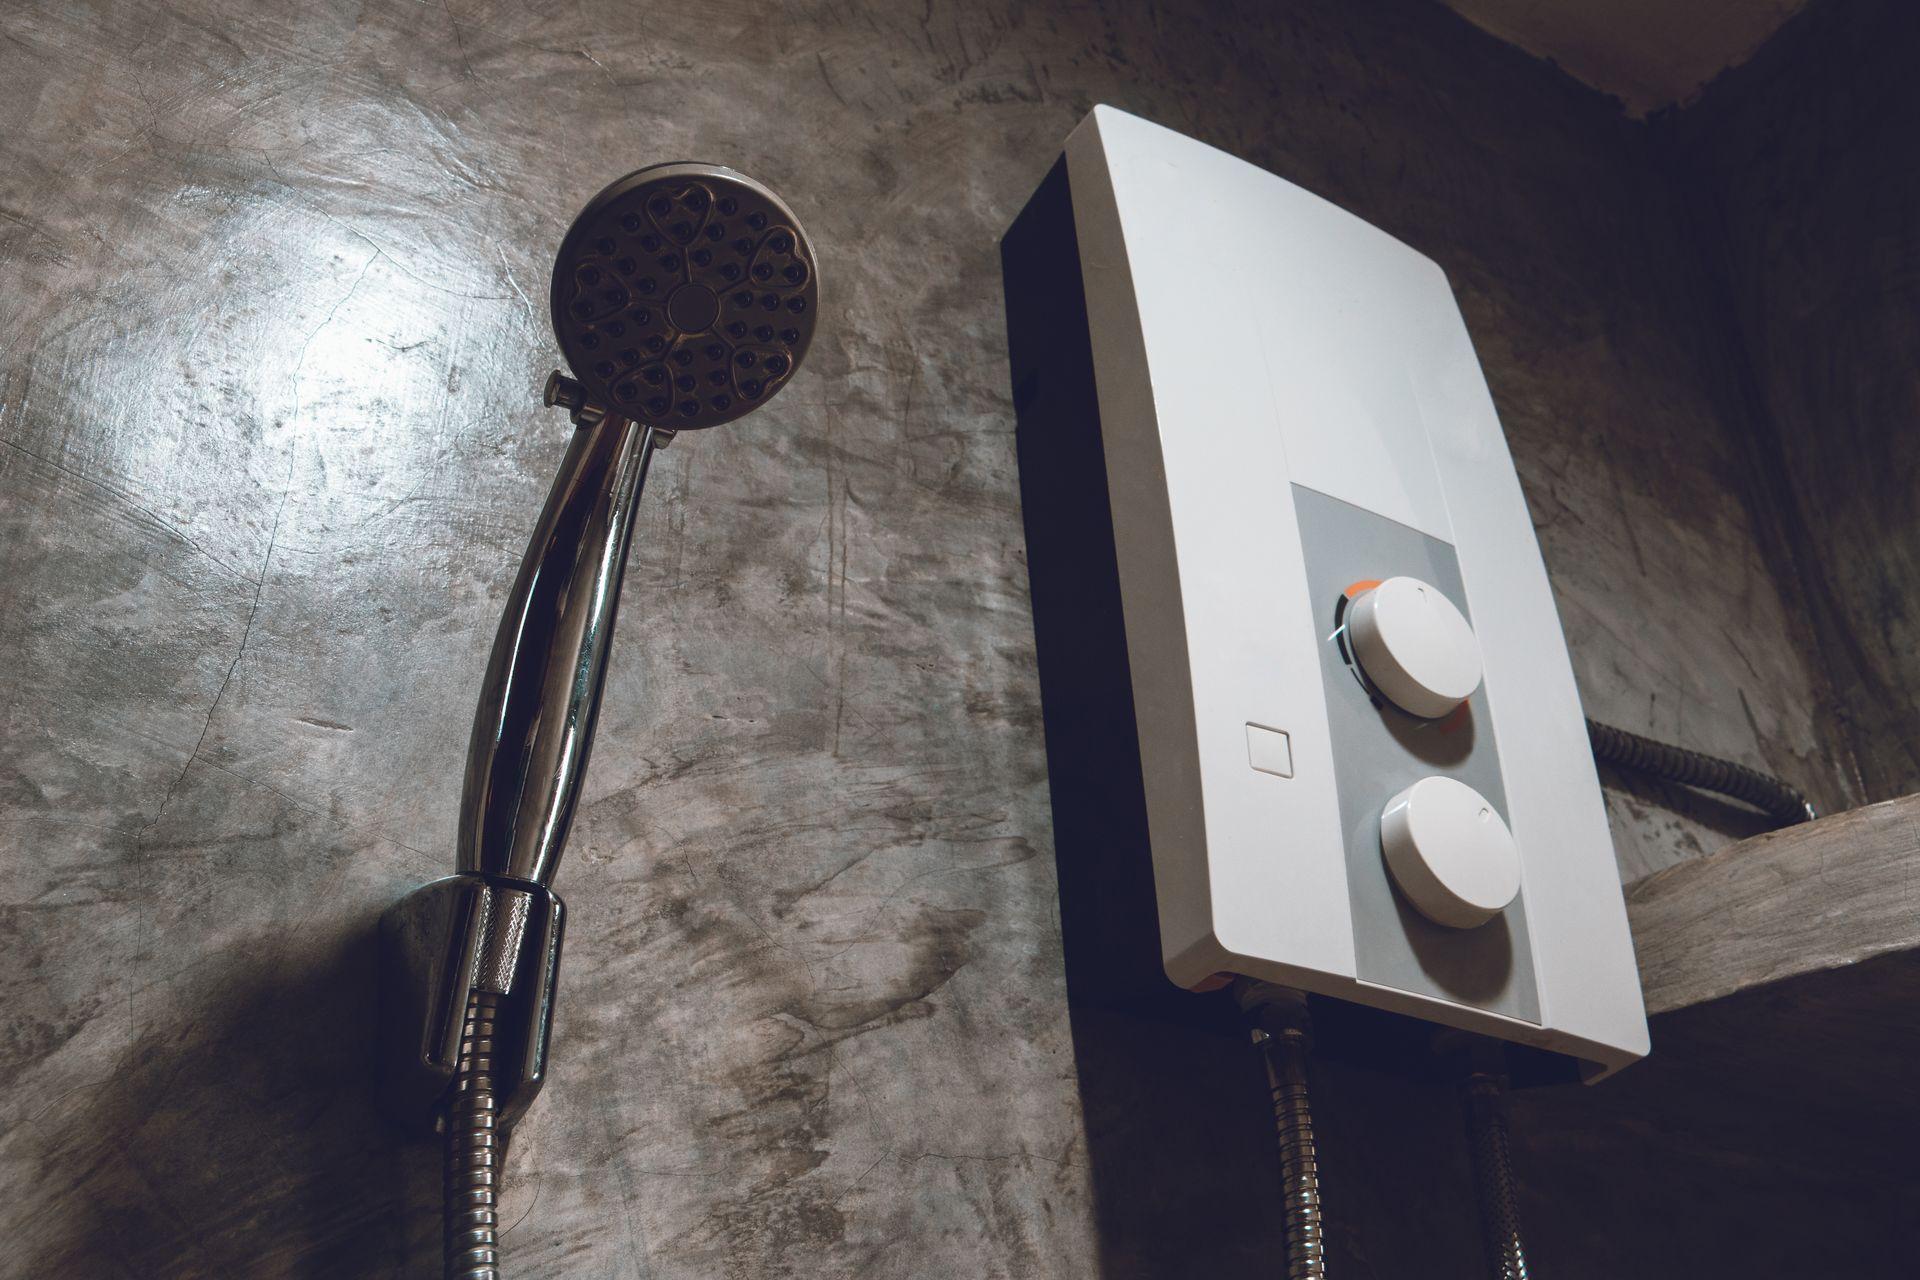 Showerhead and hot water tank on Hamilton bathroom wall